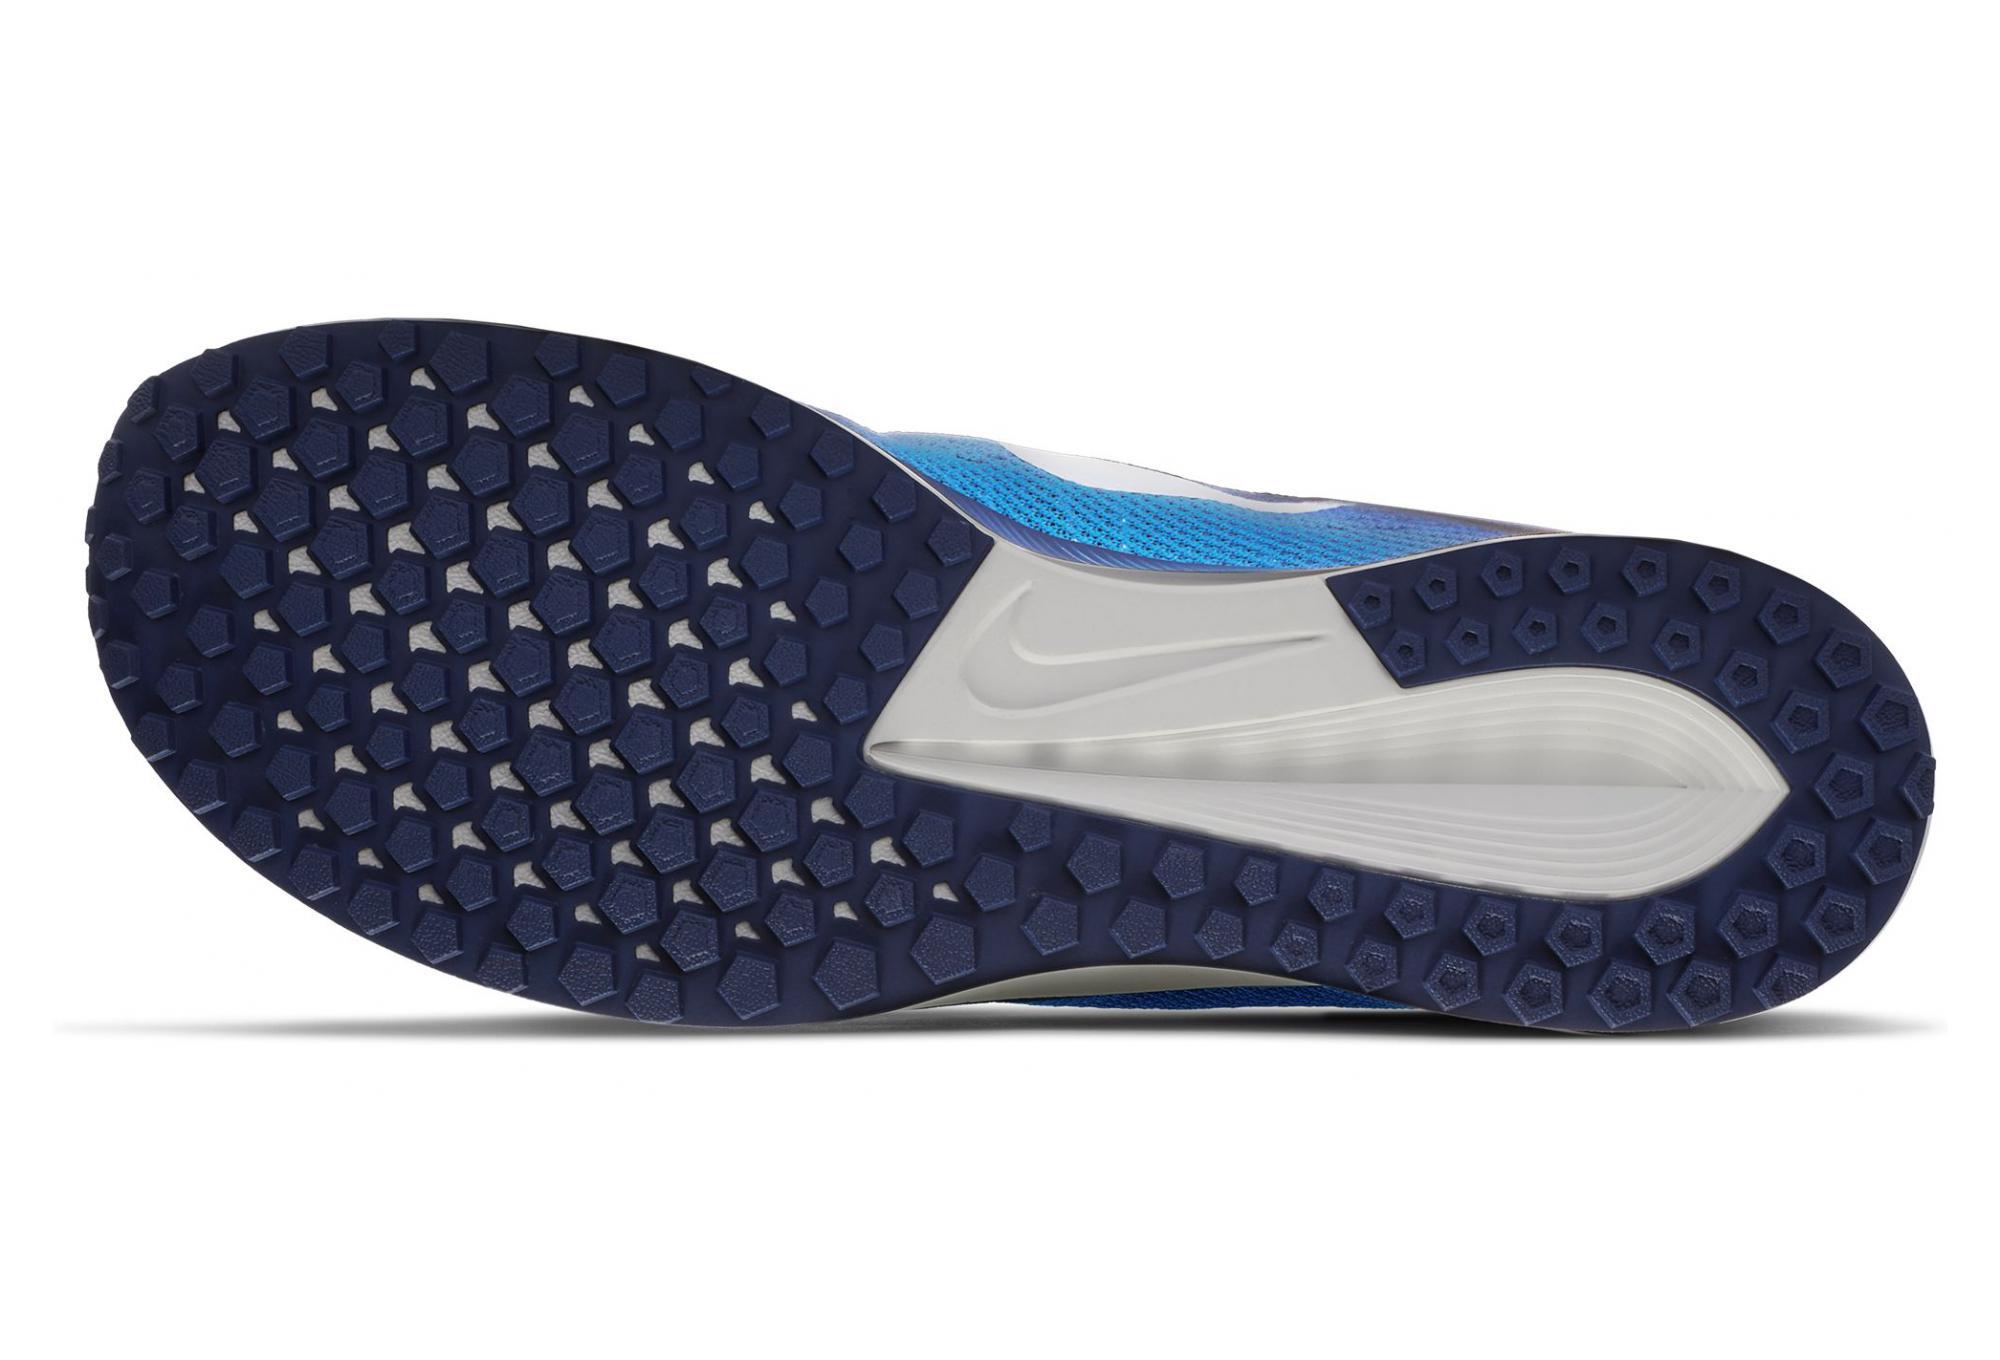 Nike Schuhe Air Zoom Elite 10 Blau Weiß Männer